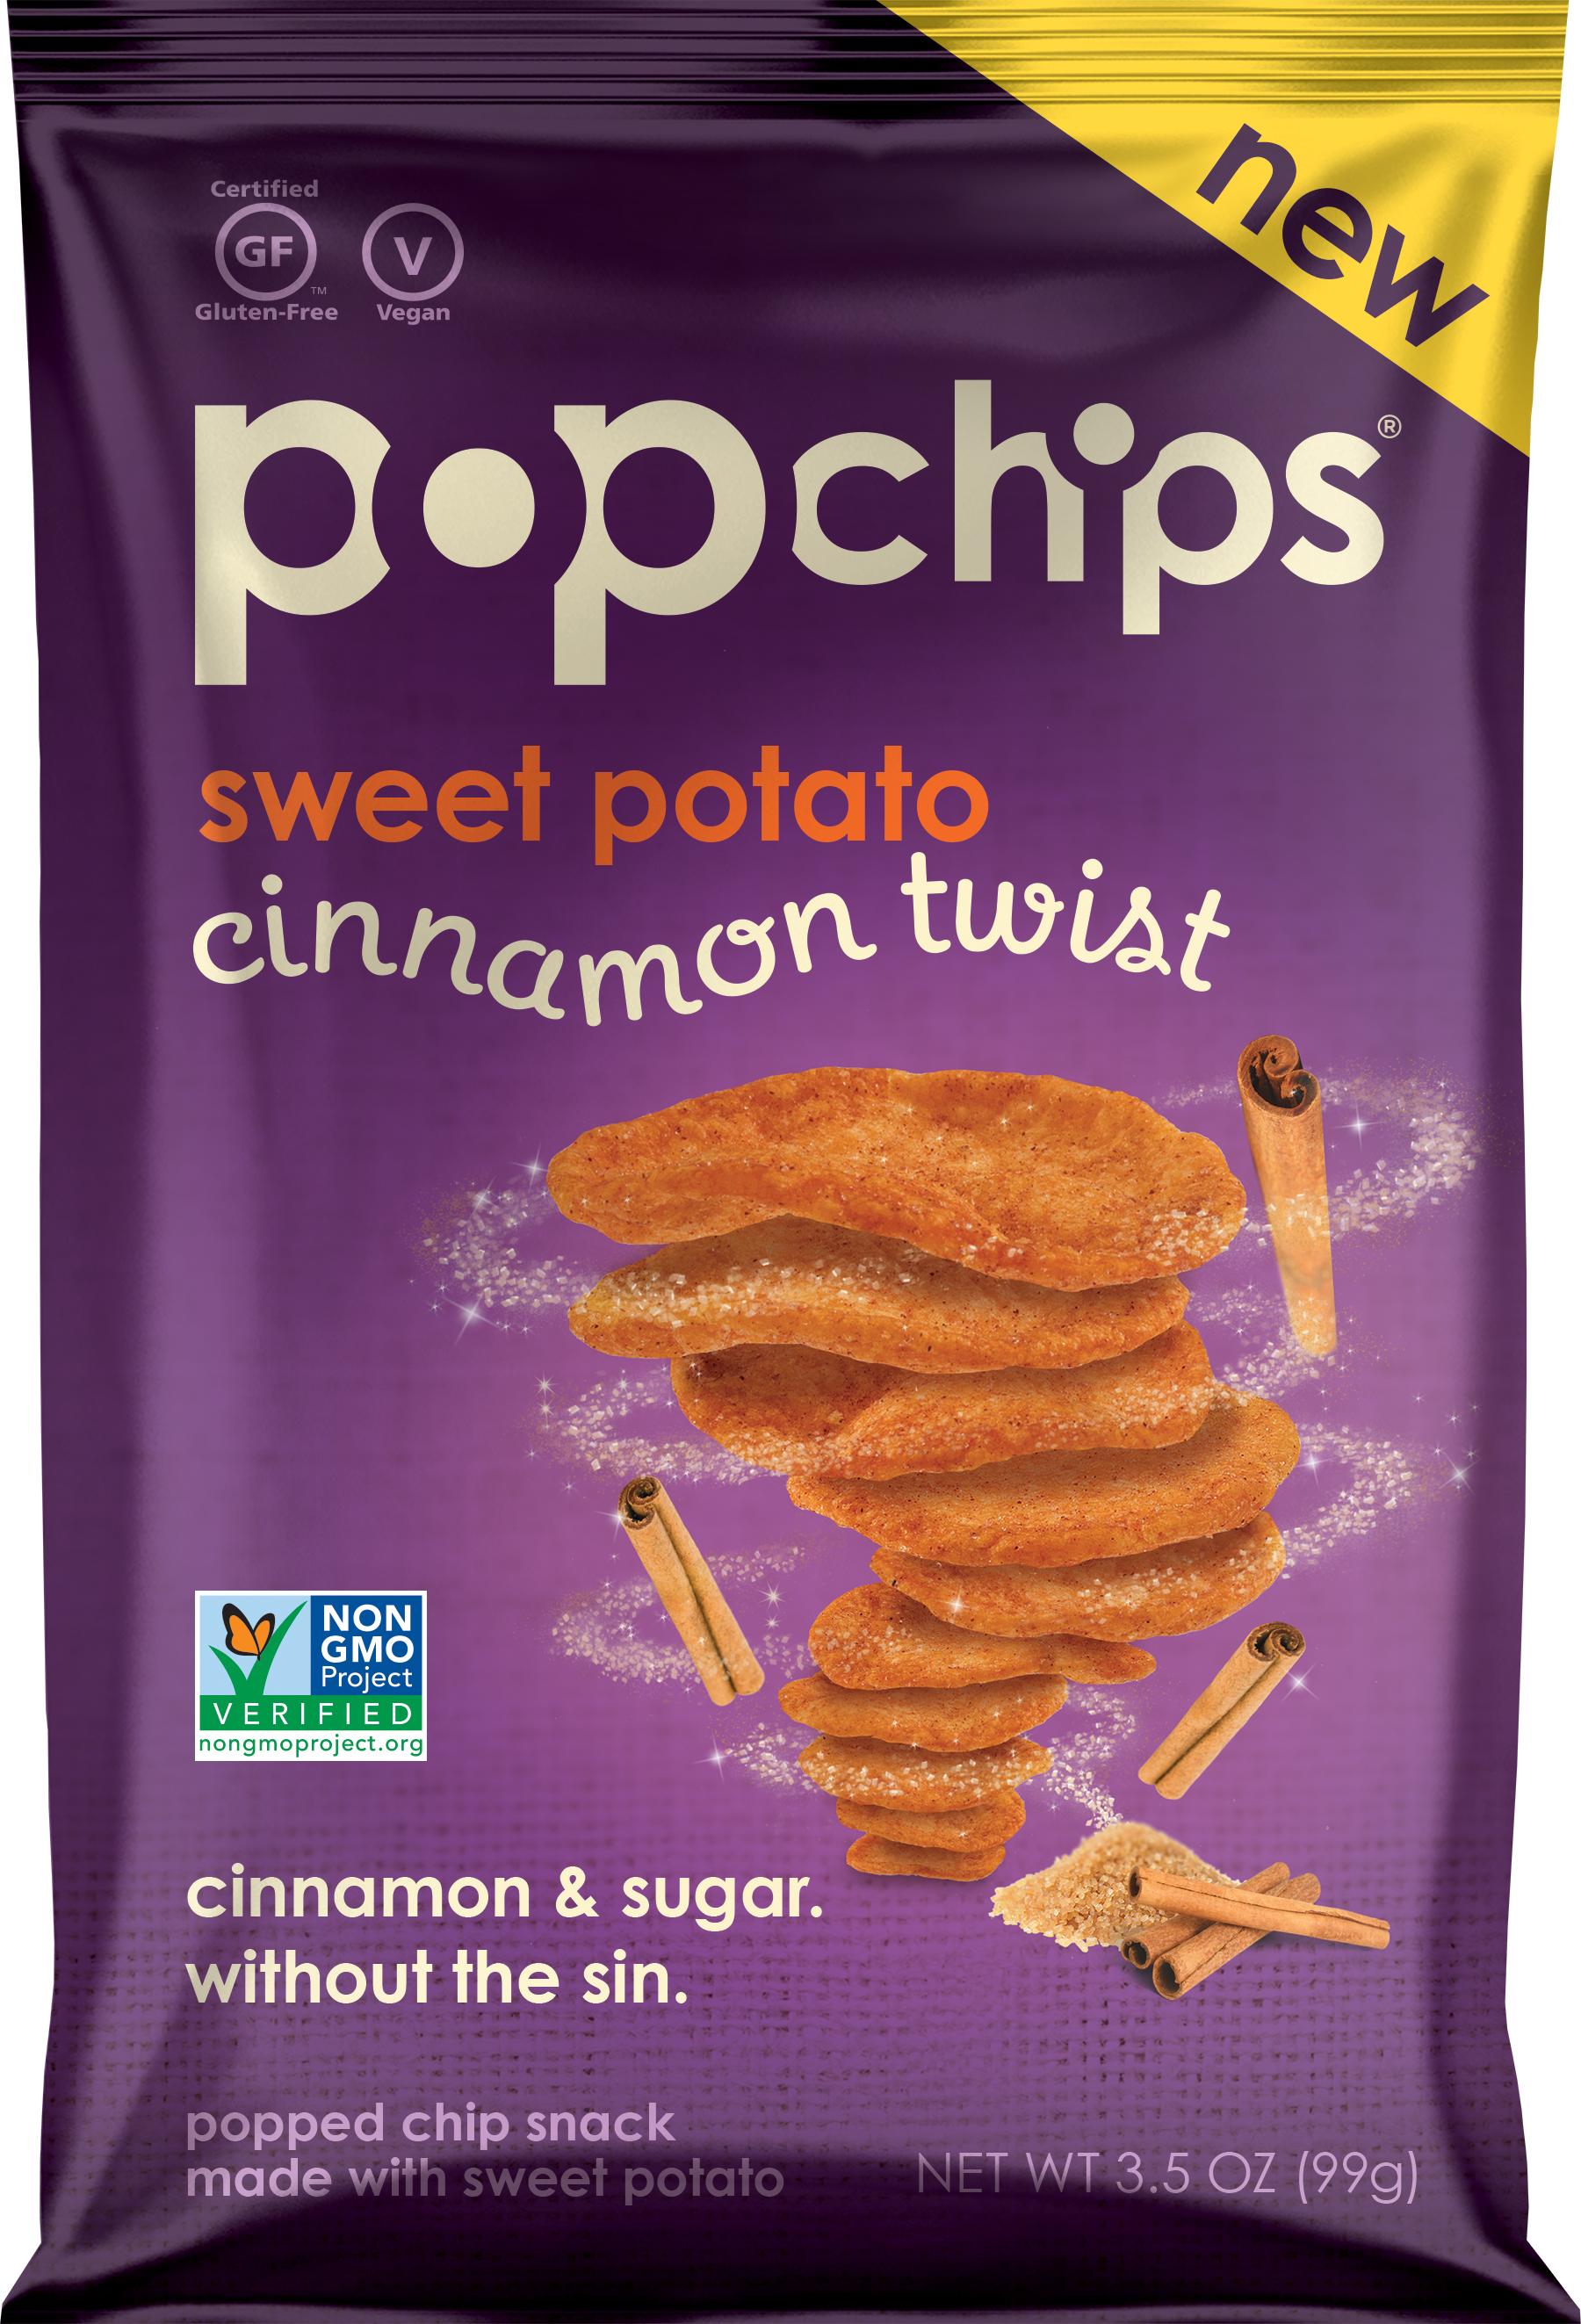 popchips: Cinnamon Twist Sweet Potato